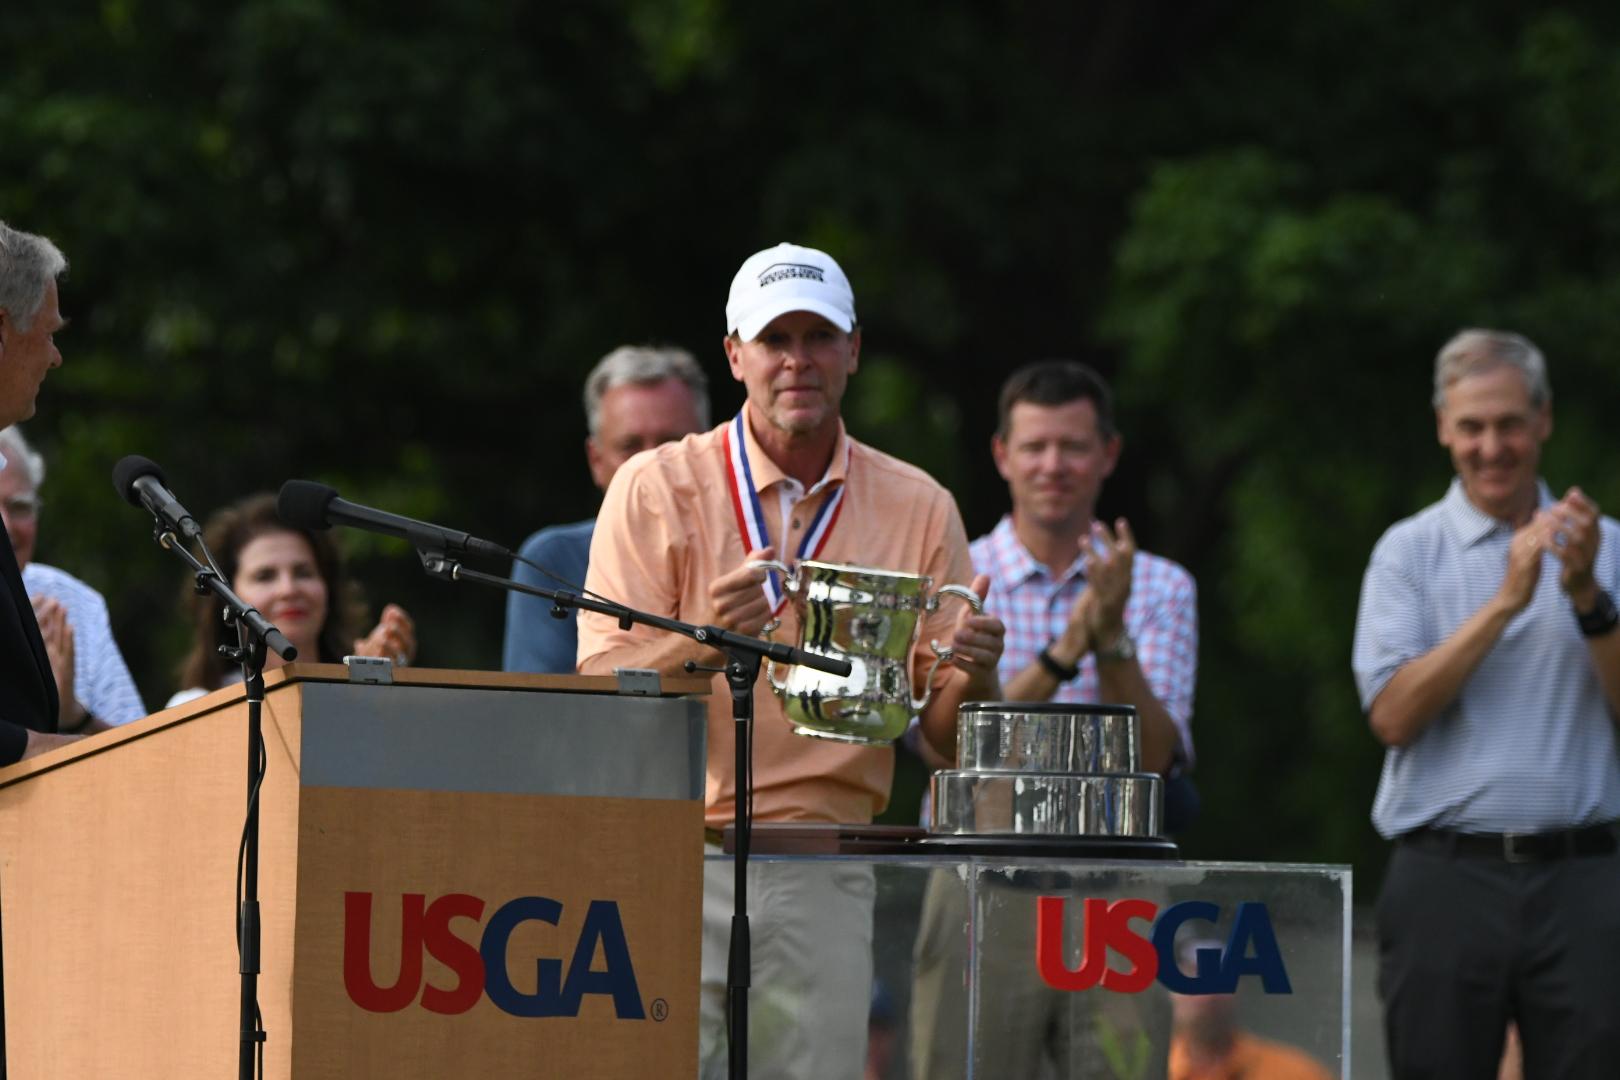 USGA: Championship Sunday, Stricker Wins It All